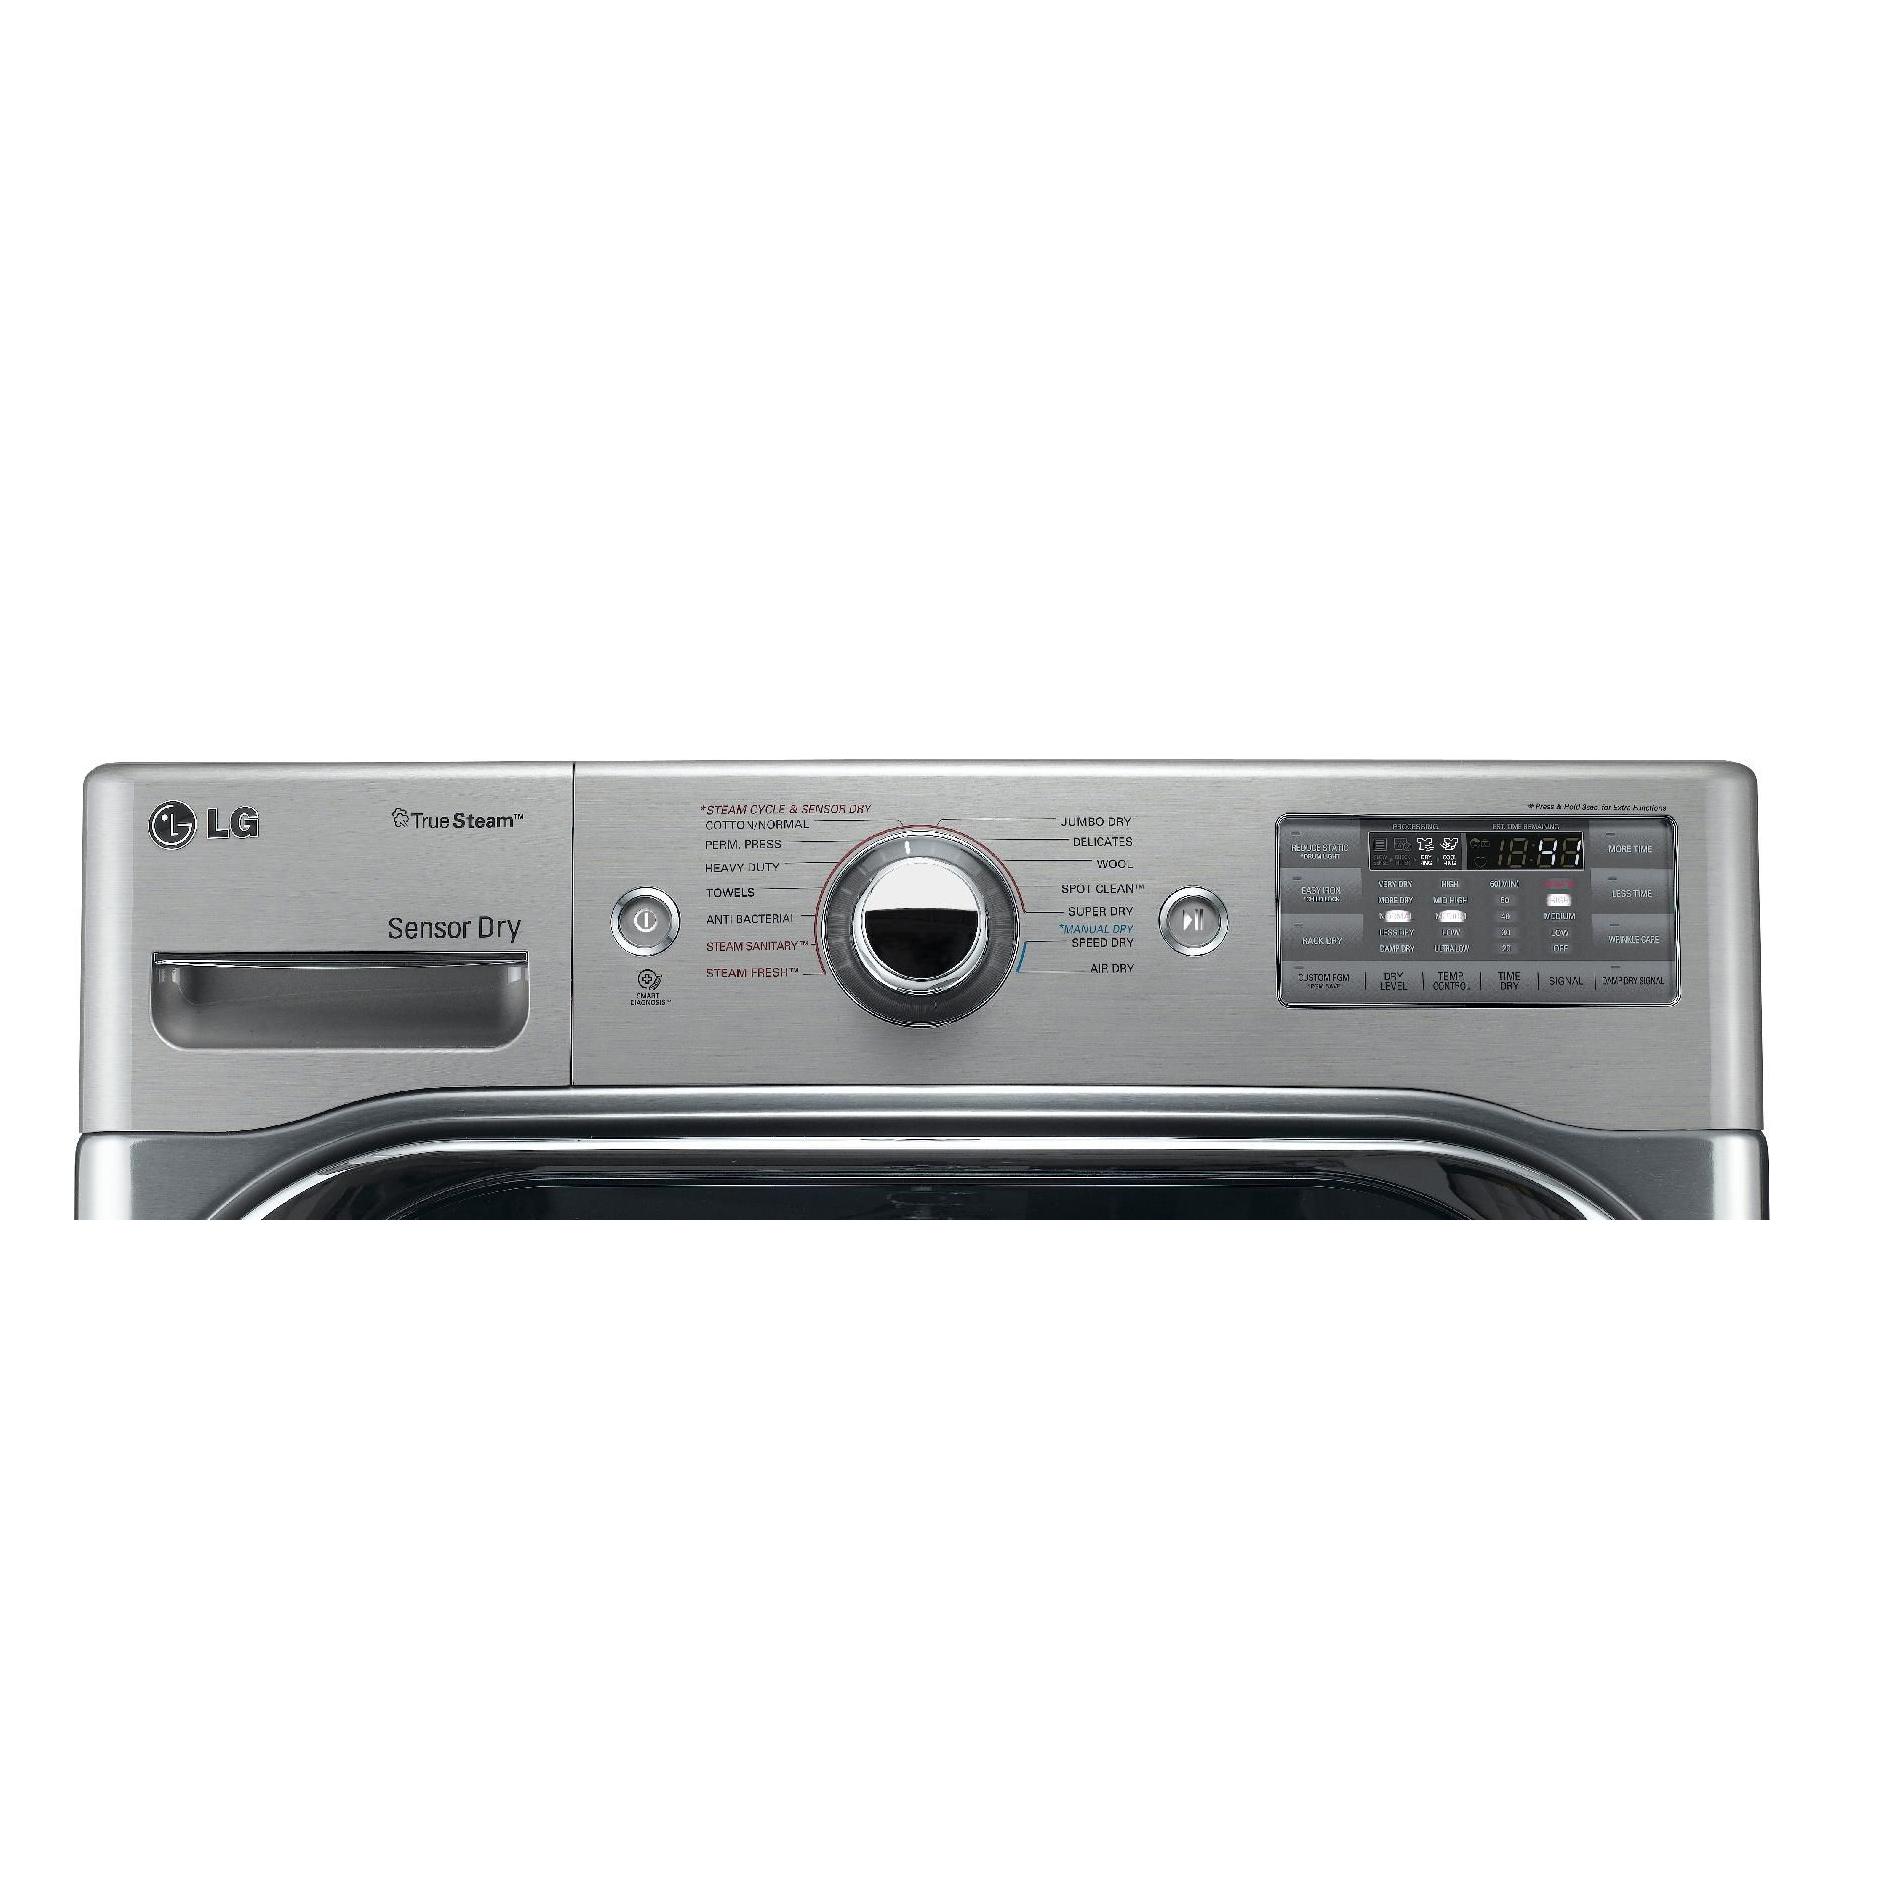 LG DLGX8001V 9.0 cu. ft. Mega-Capacity Steam Gas Dryer w/ Sensor Dry - Graphite Steel